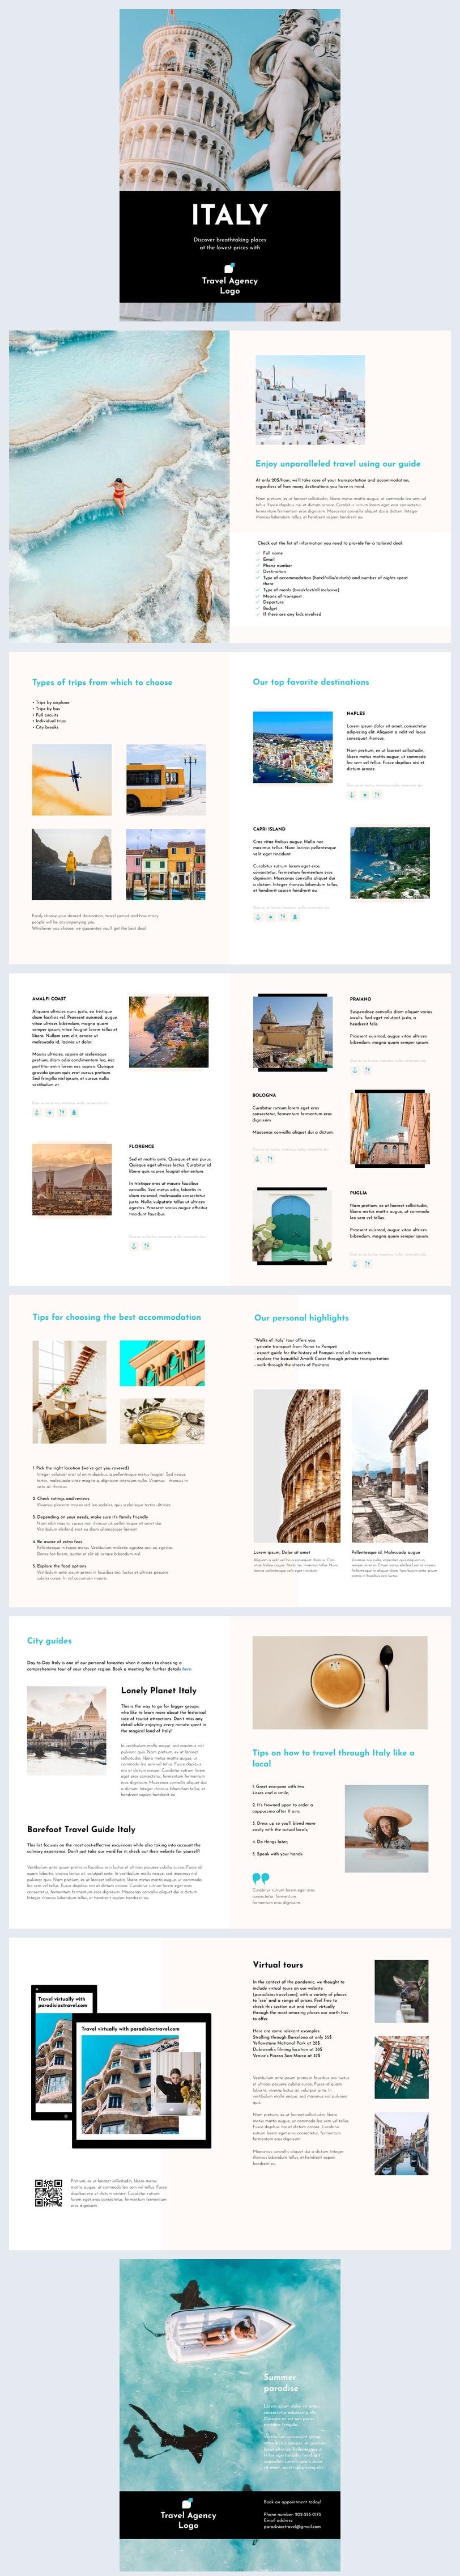 Free Travel Brochure Design Example